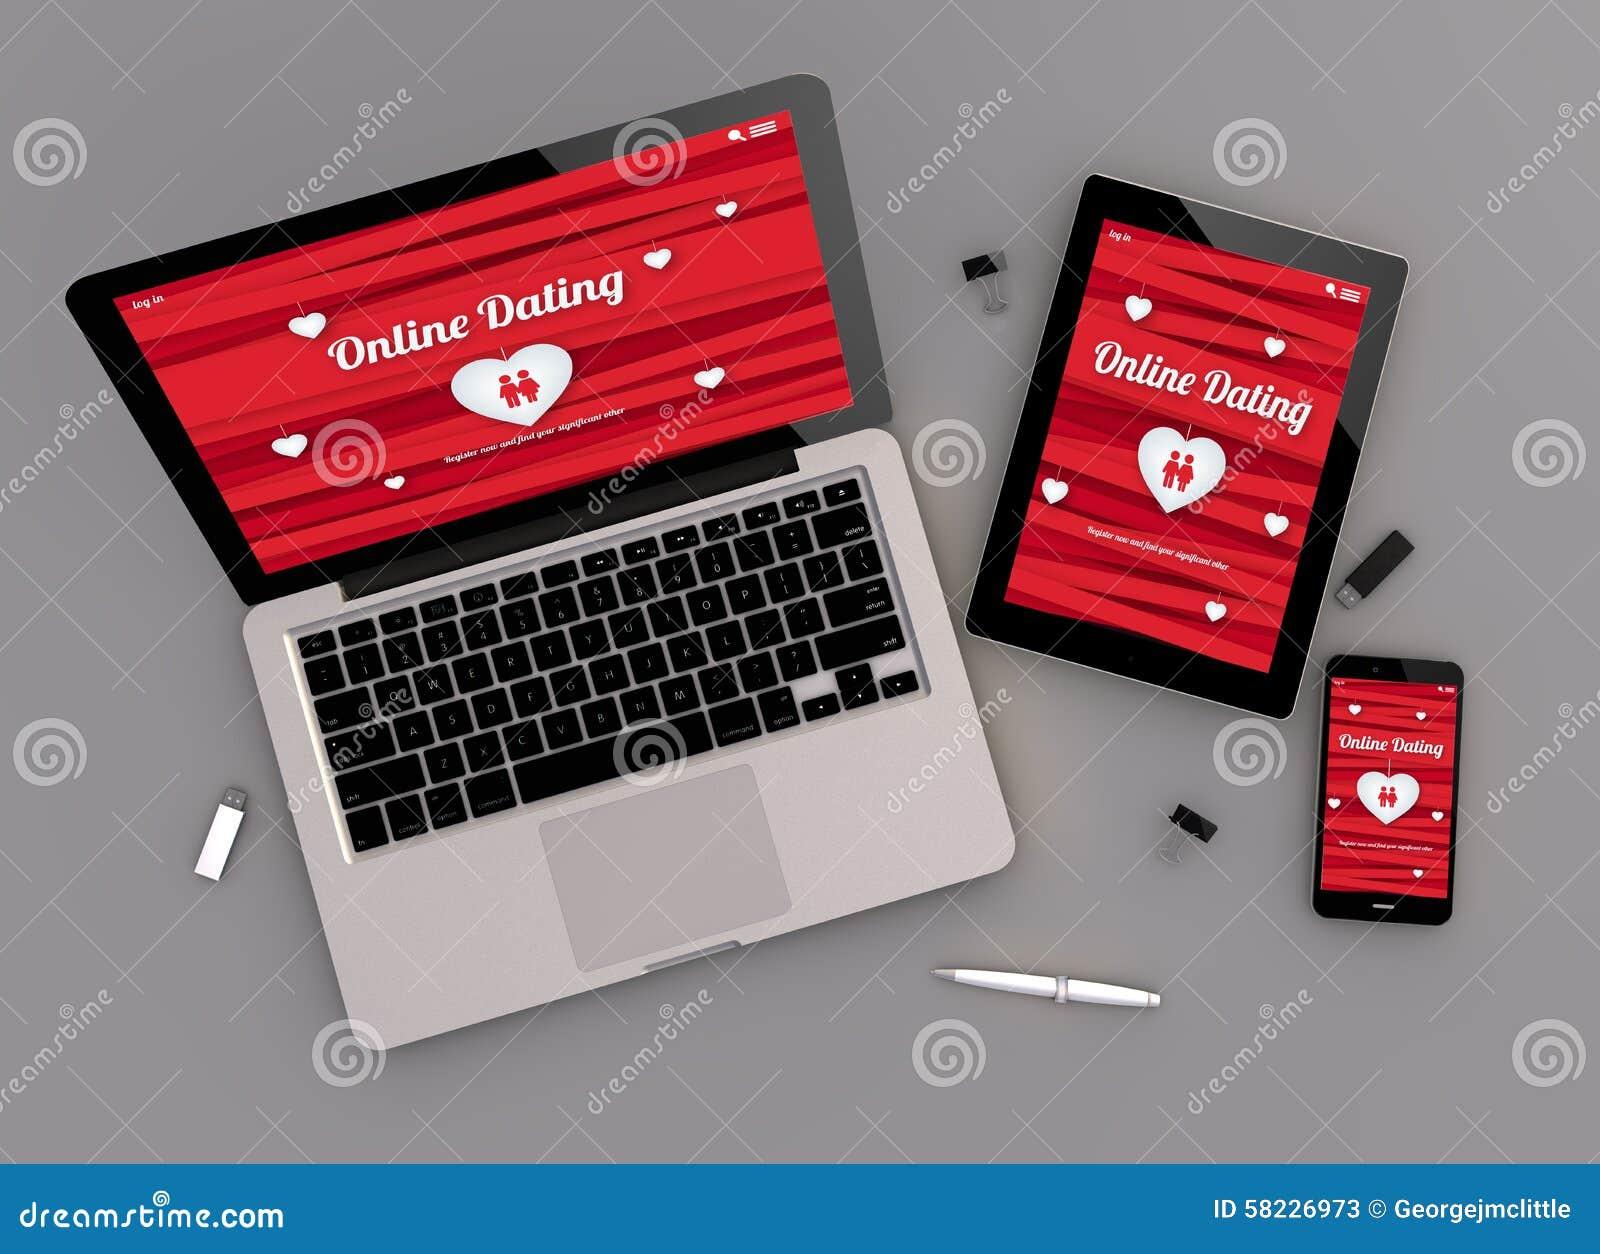 design dating